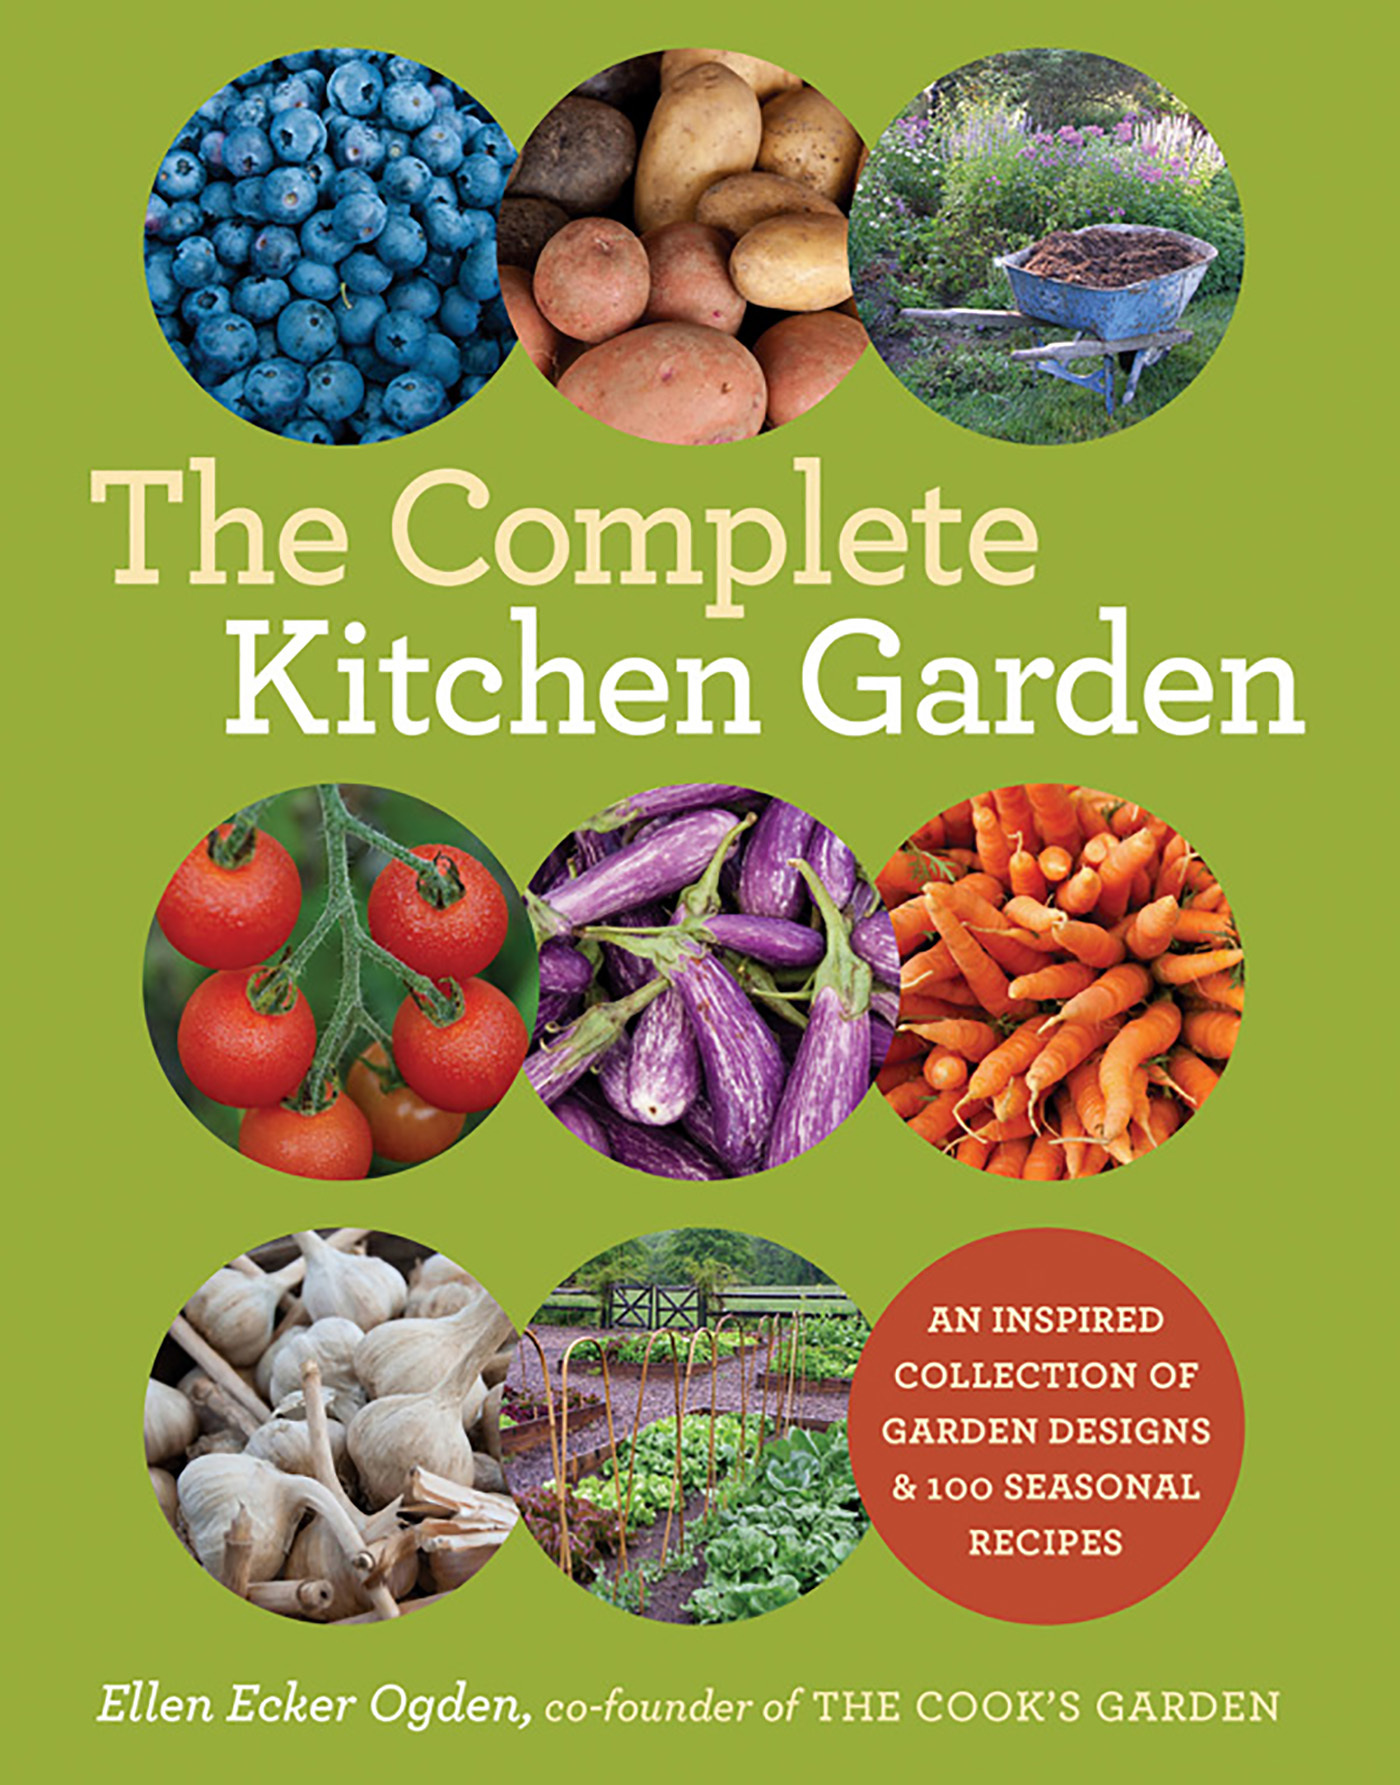 The Complete Kitchen Garden: An Inspired Collection of Garden Designs  100 Seasonal Recipes